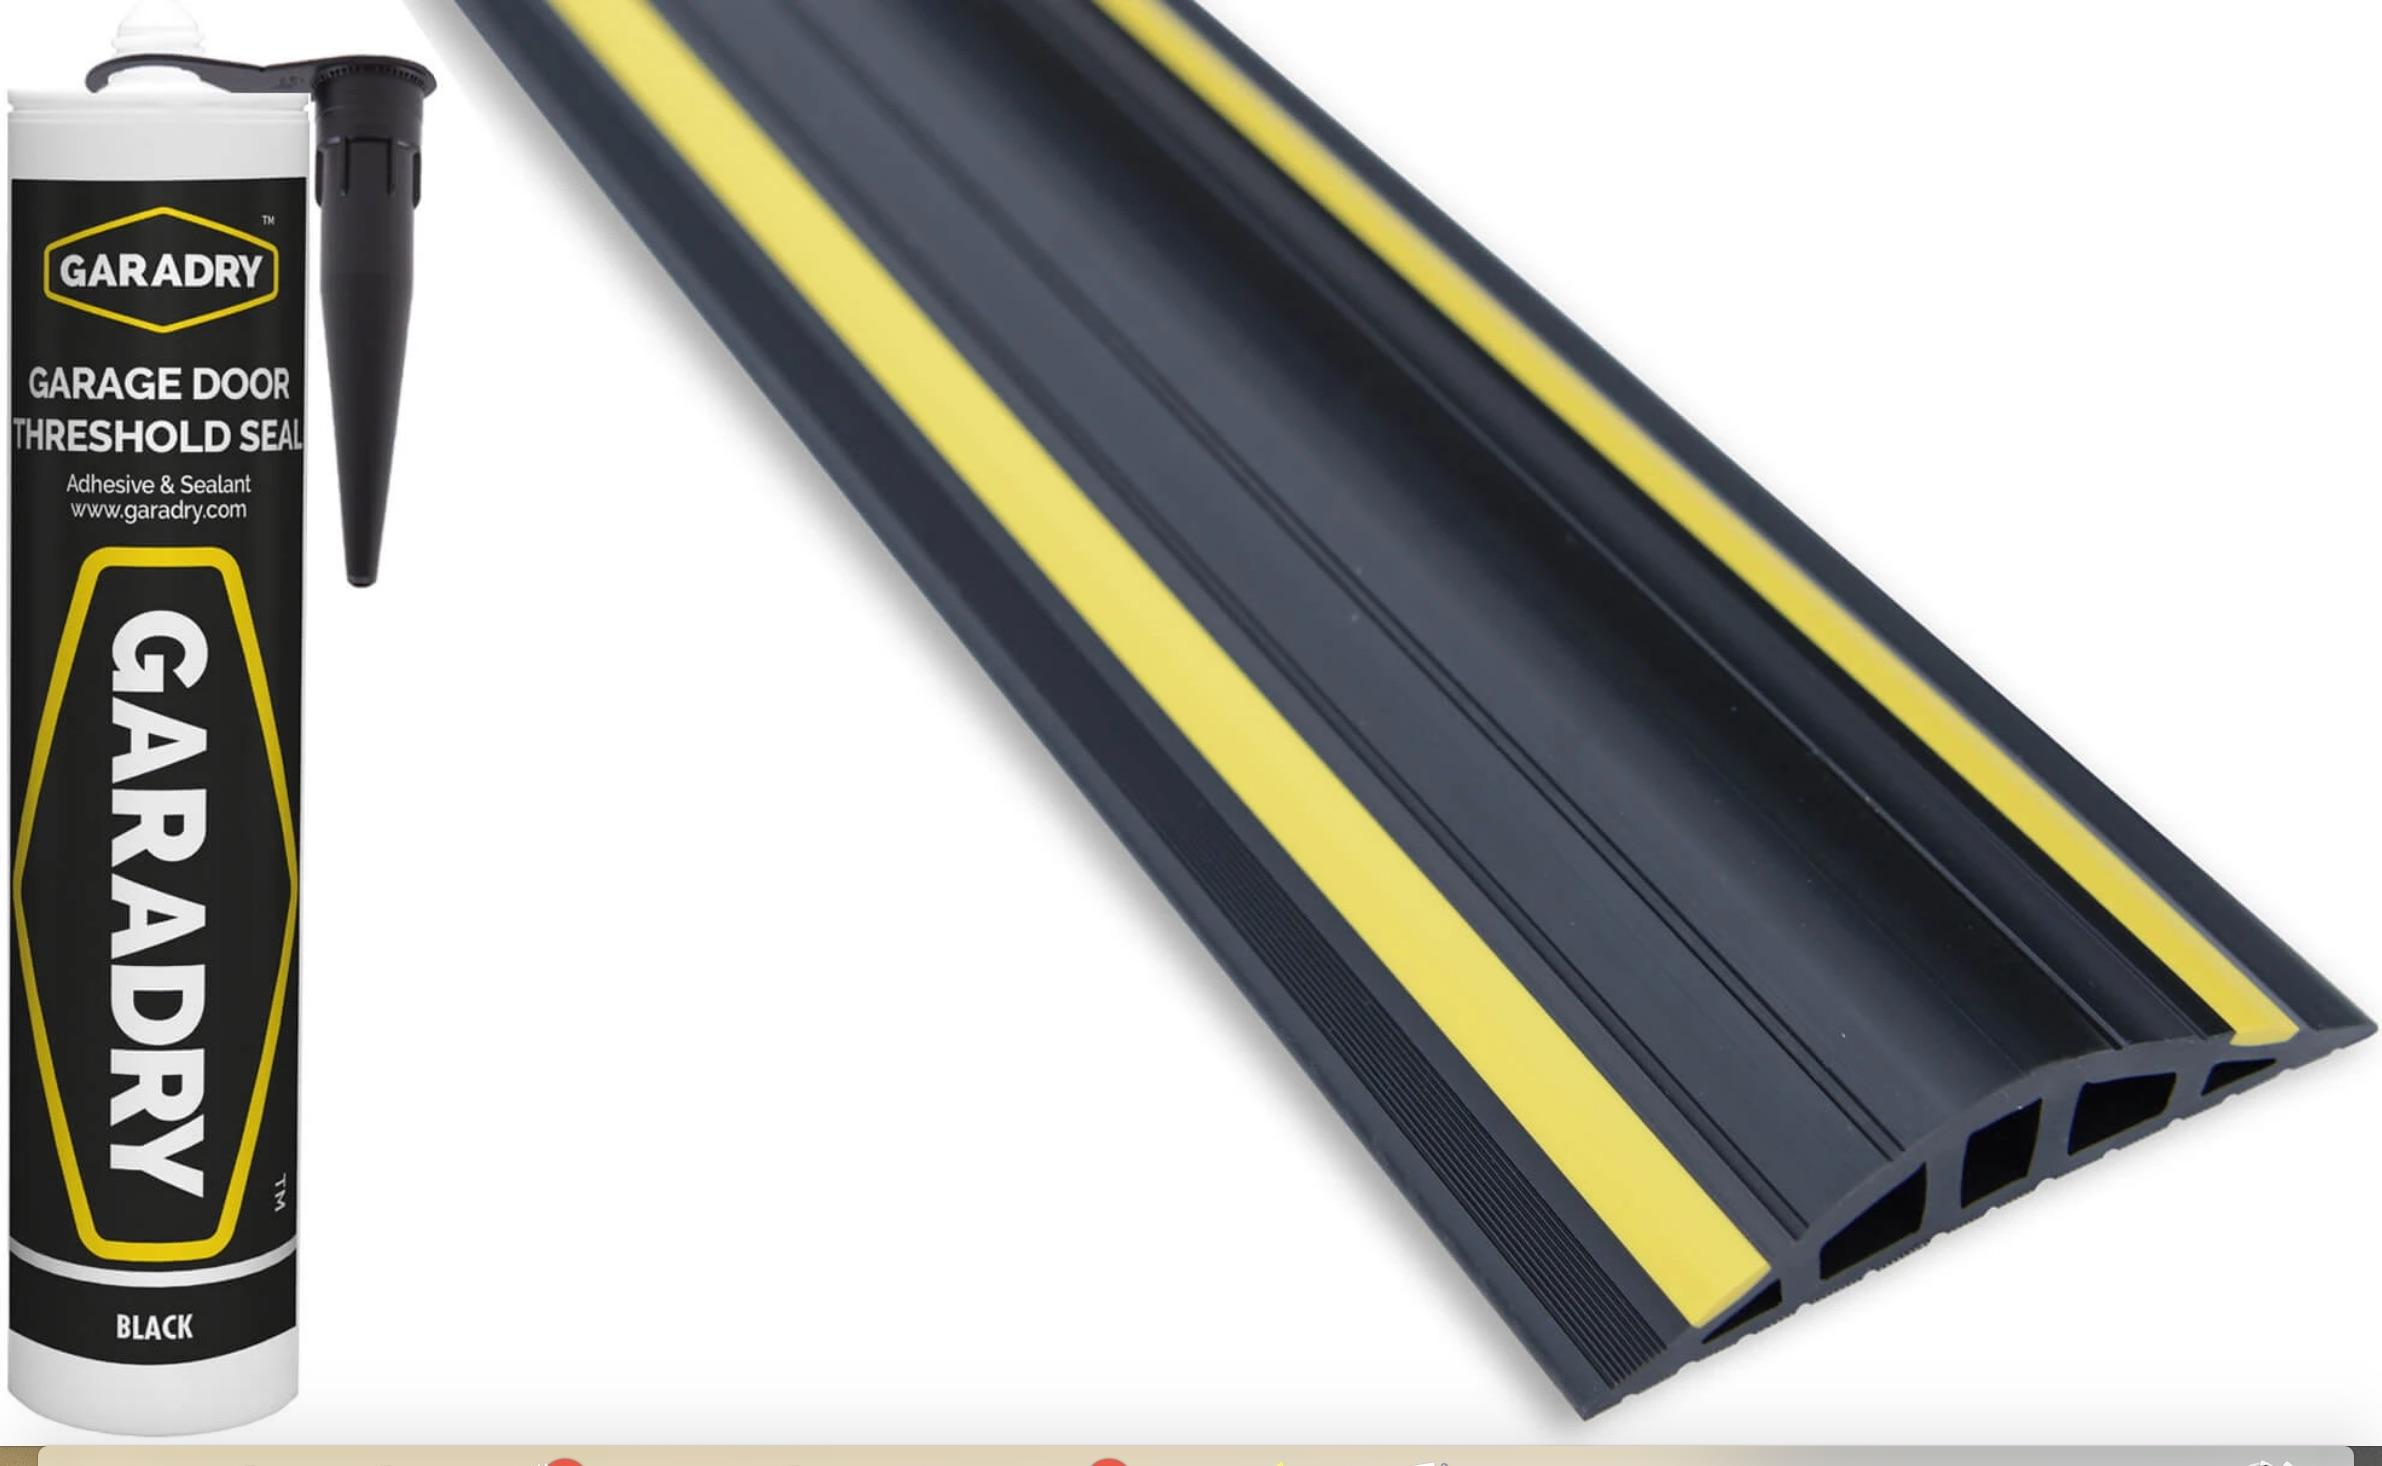 25mm High x 6.17m - 20 foot 3 Long 2 x adhesives